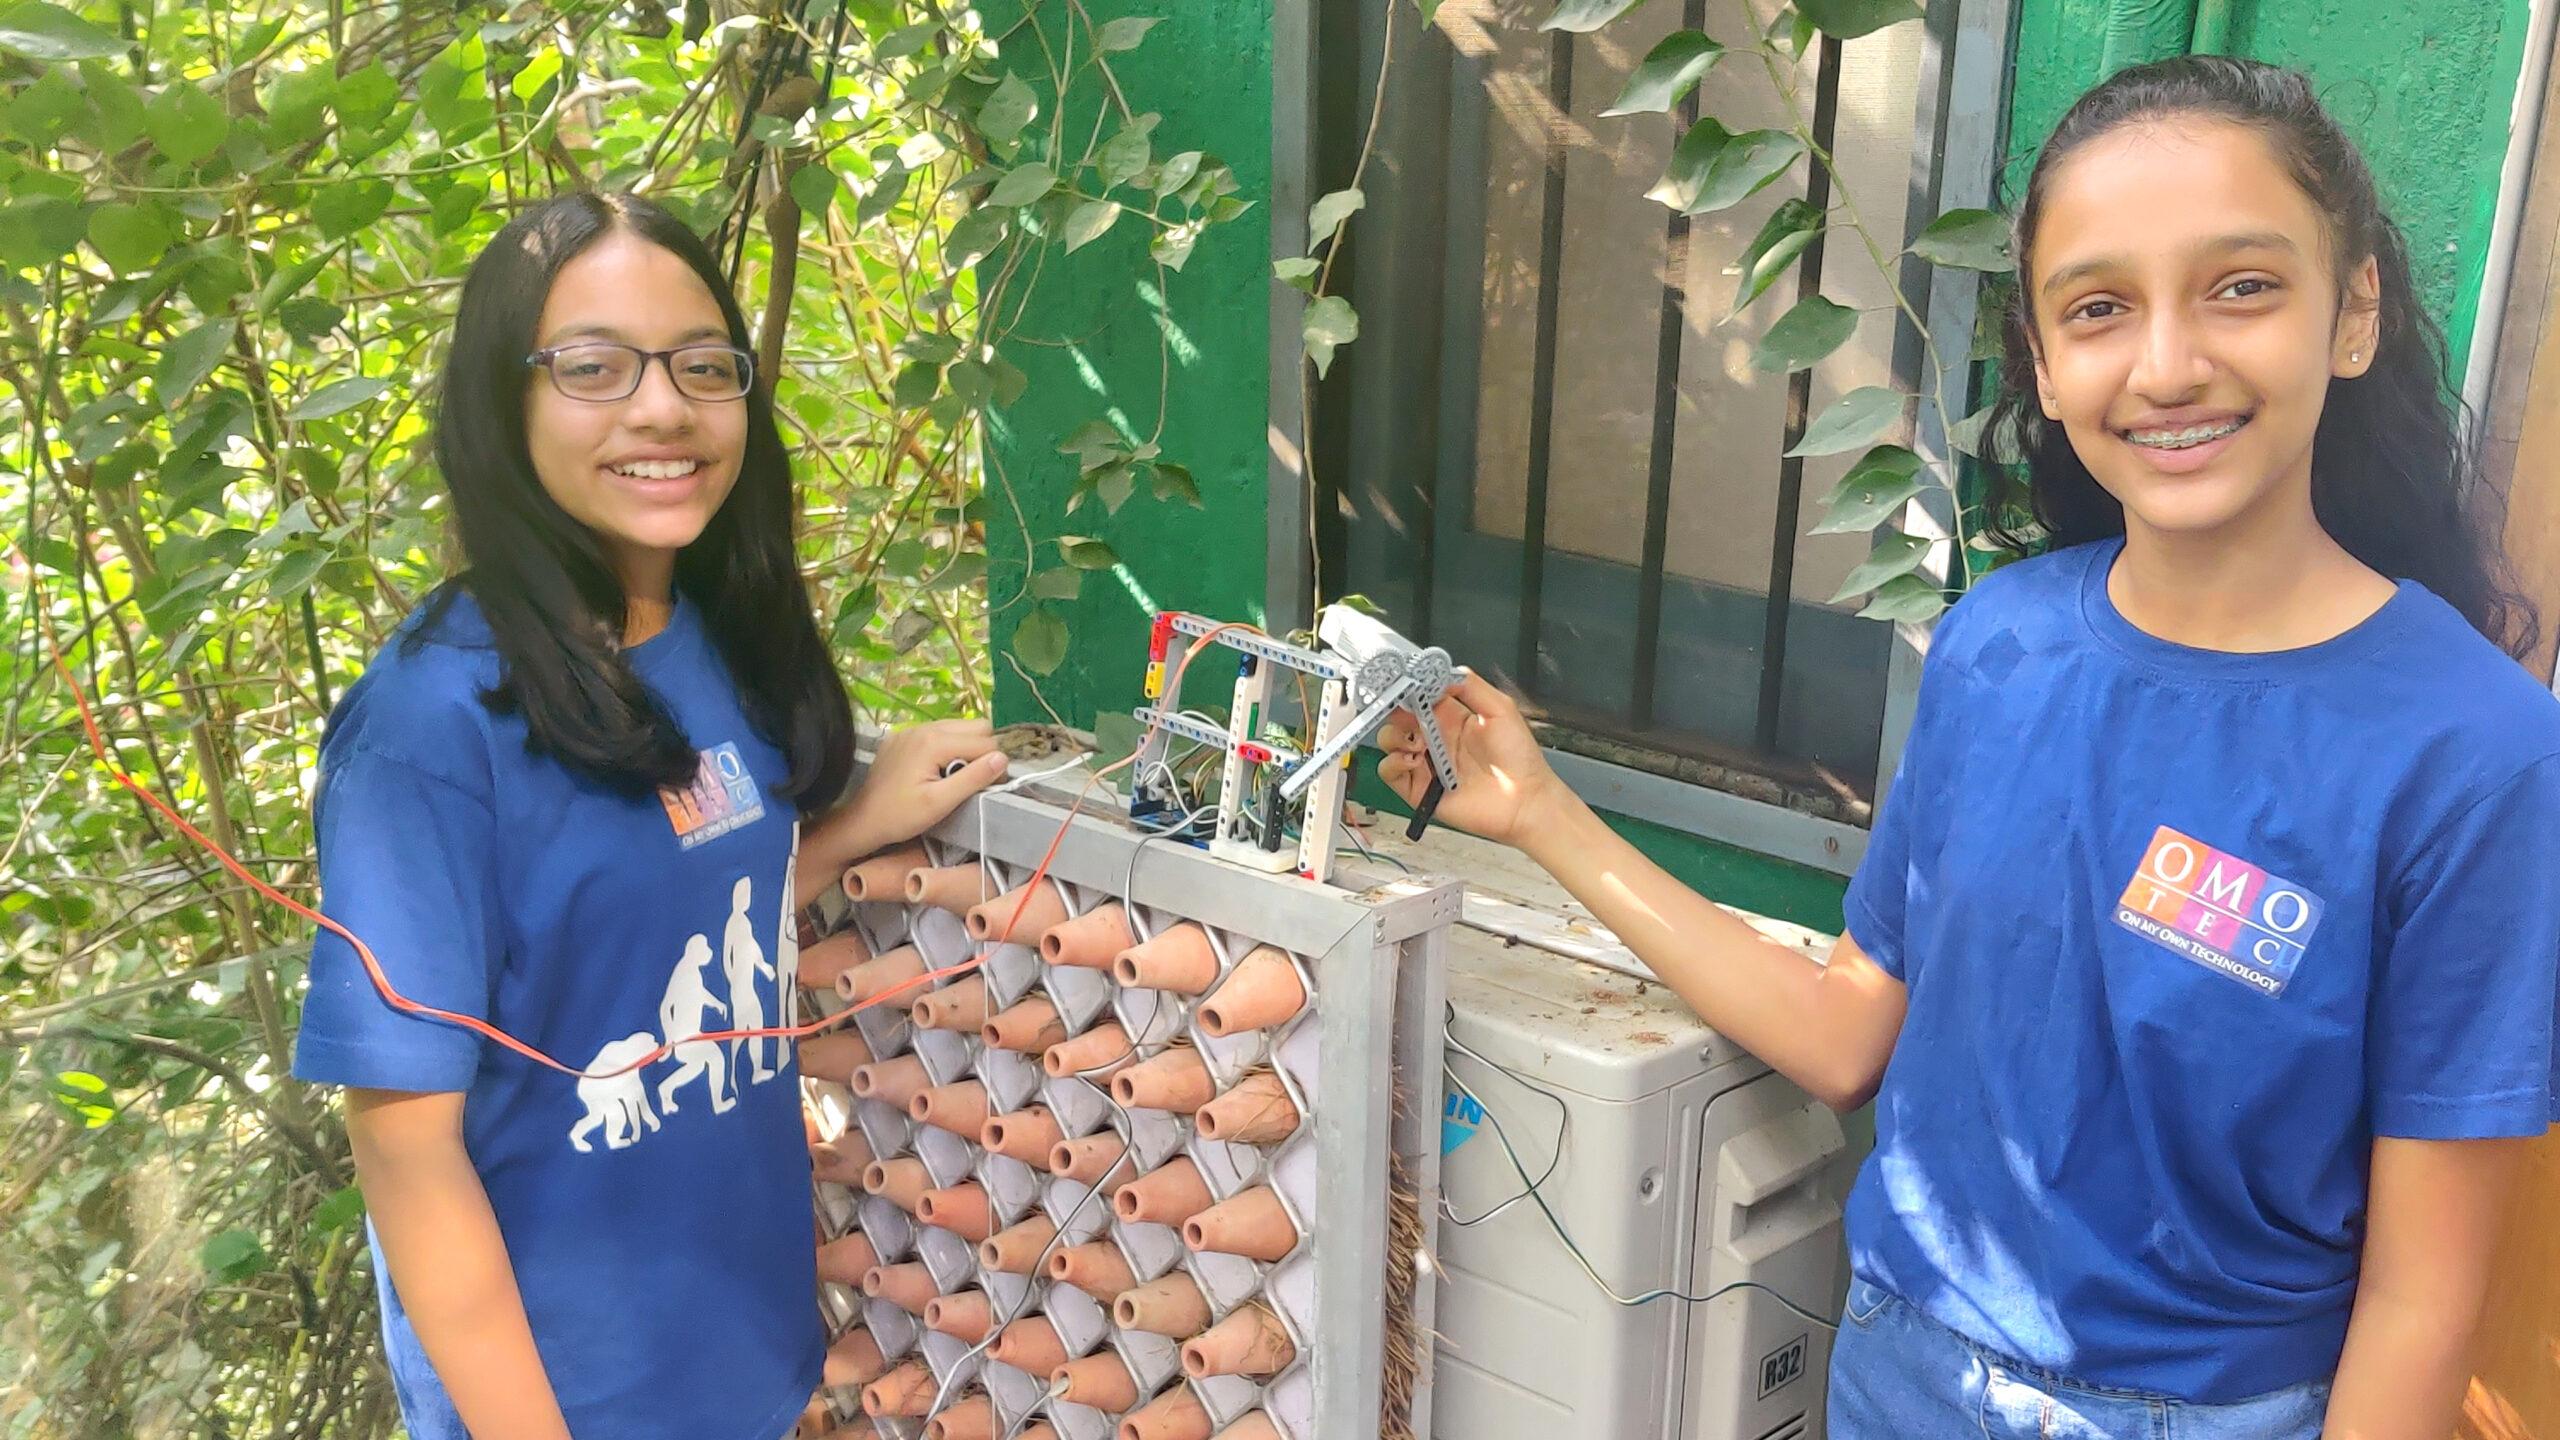 Mumbai Students Bag Gold Medal at World Robotics Olympiad 2020